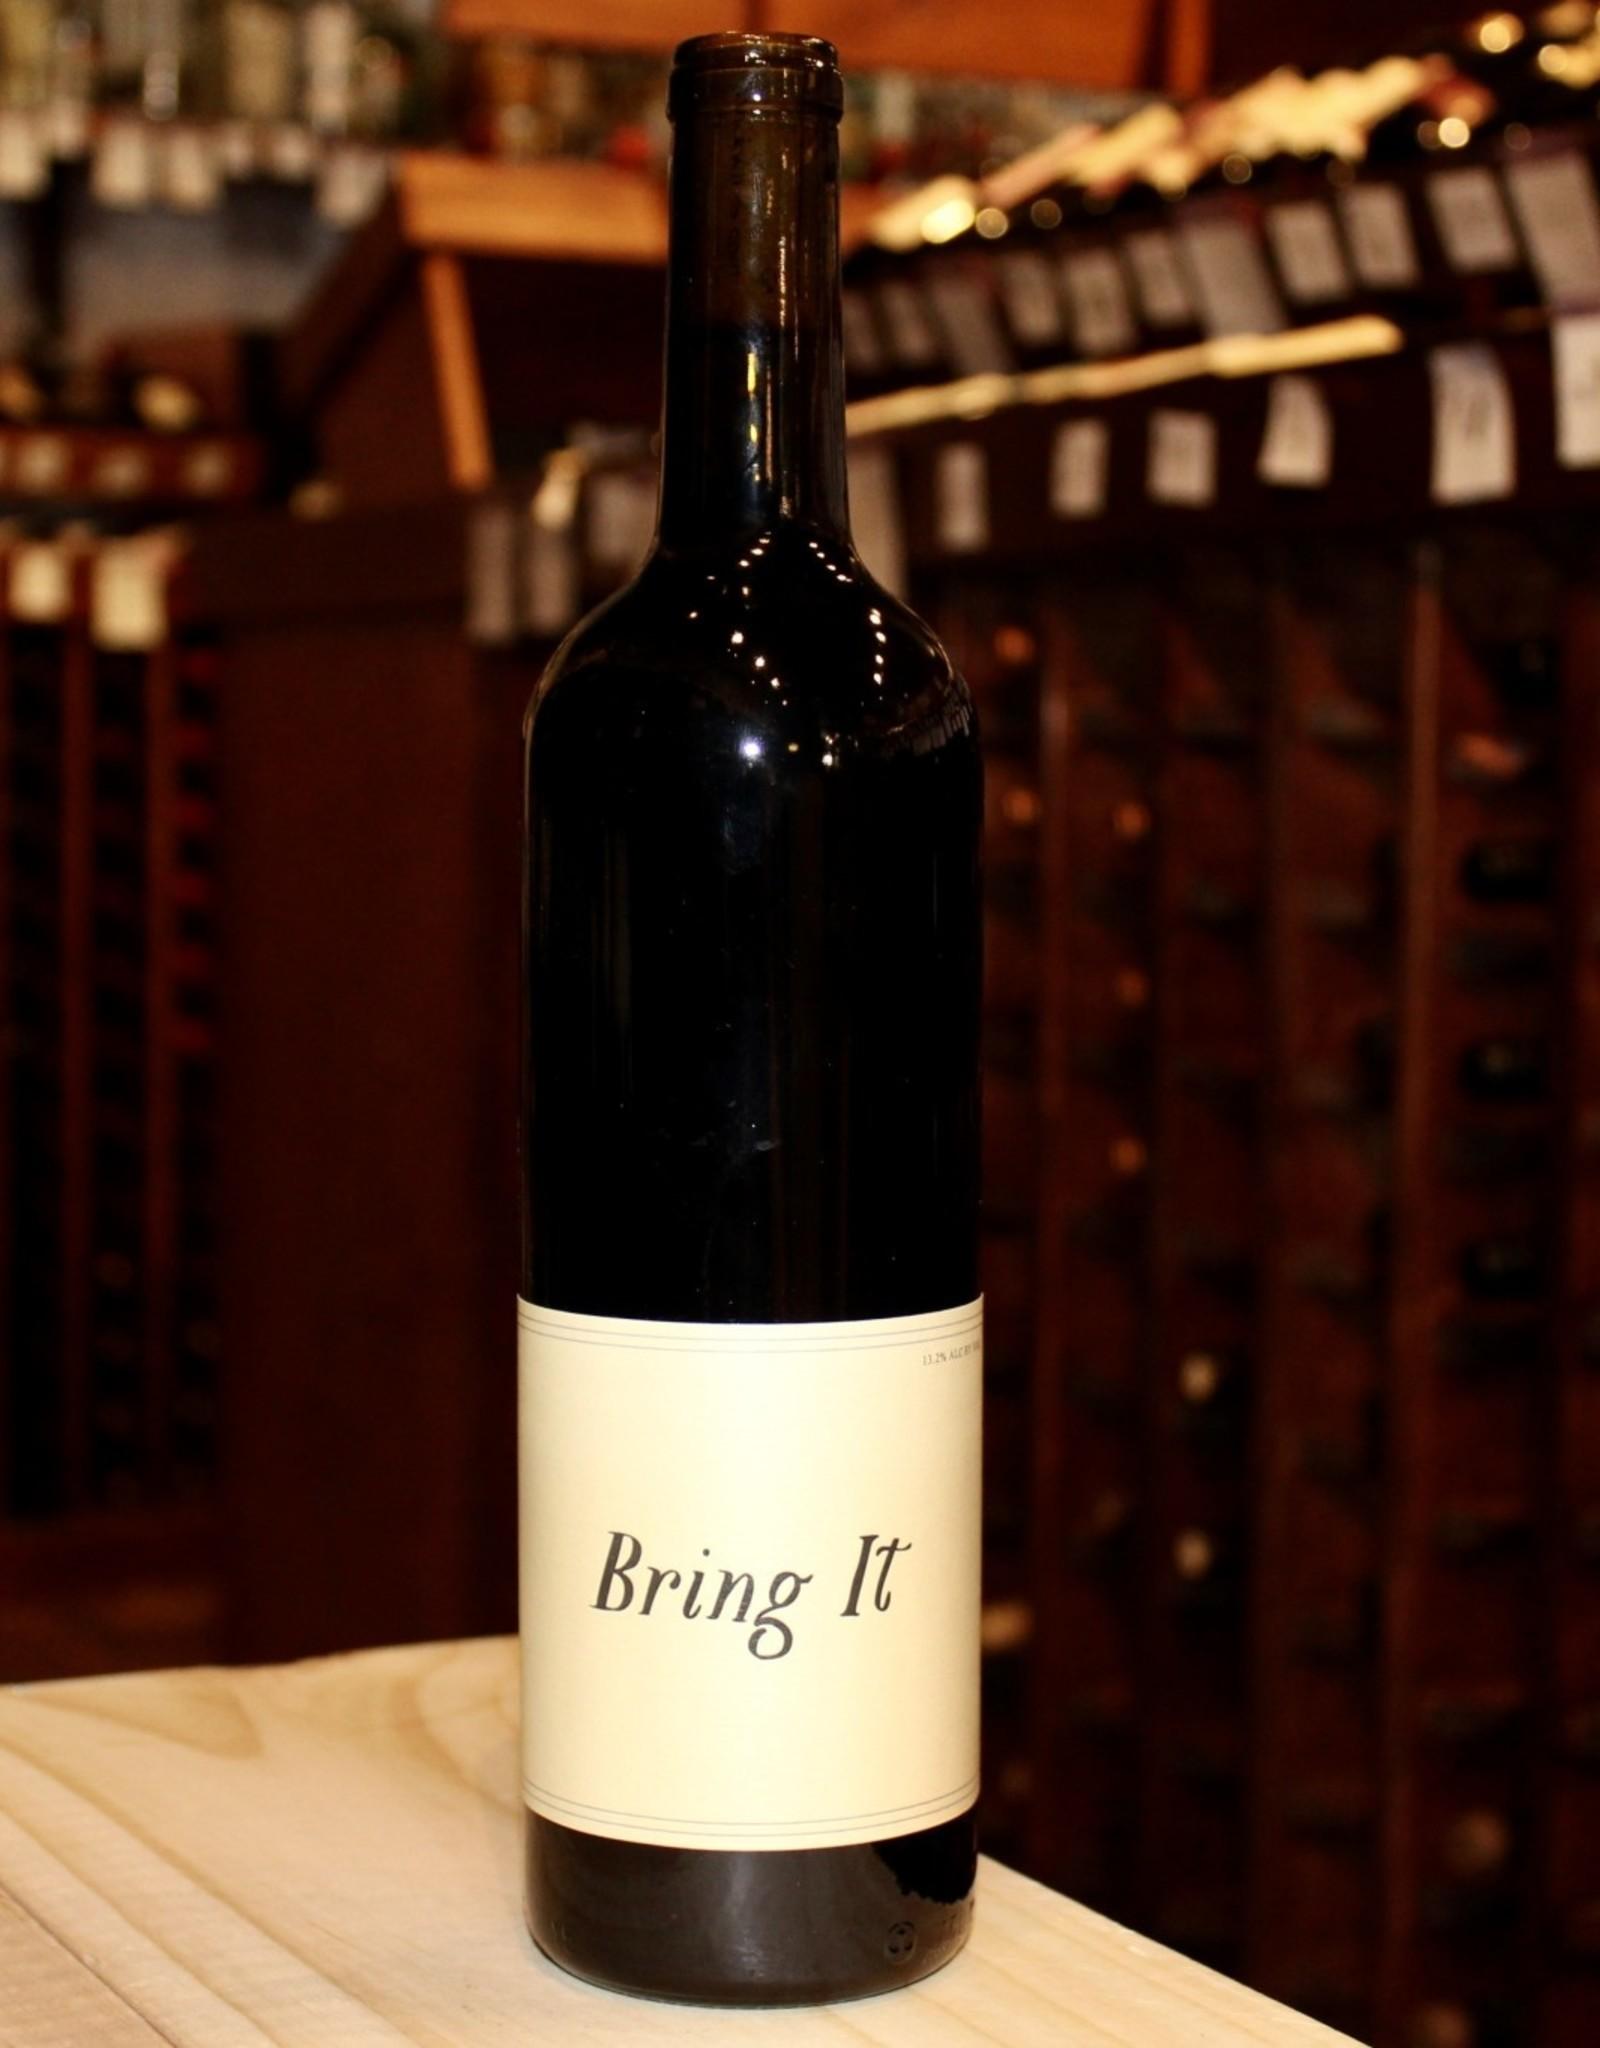 Wine 2019 Swick Wines Bring It Red Blend - Oregon (750ml)